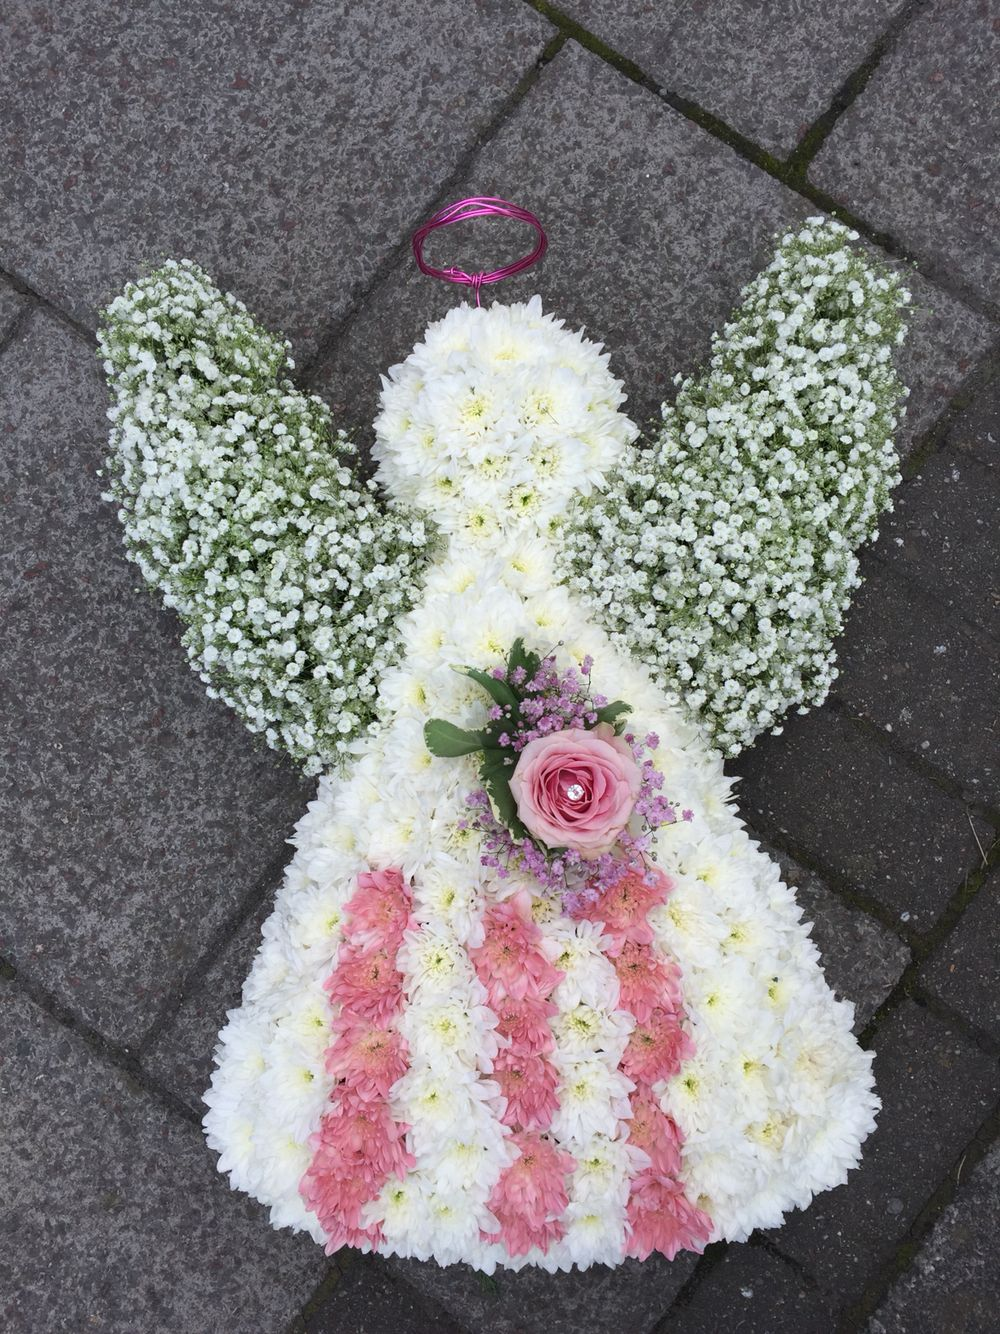 Angel funeral tribute grave flowers pinterest funeral funeral angel funeral tribute izmirmasajfo